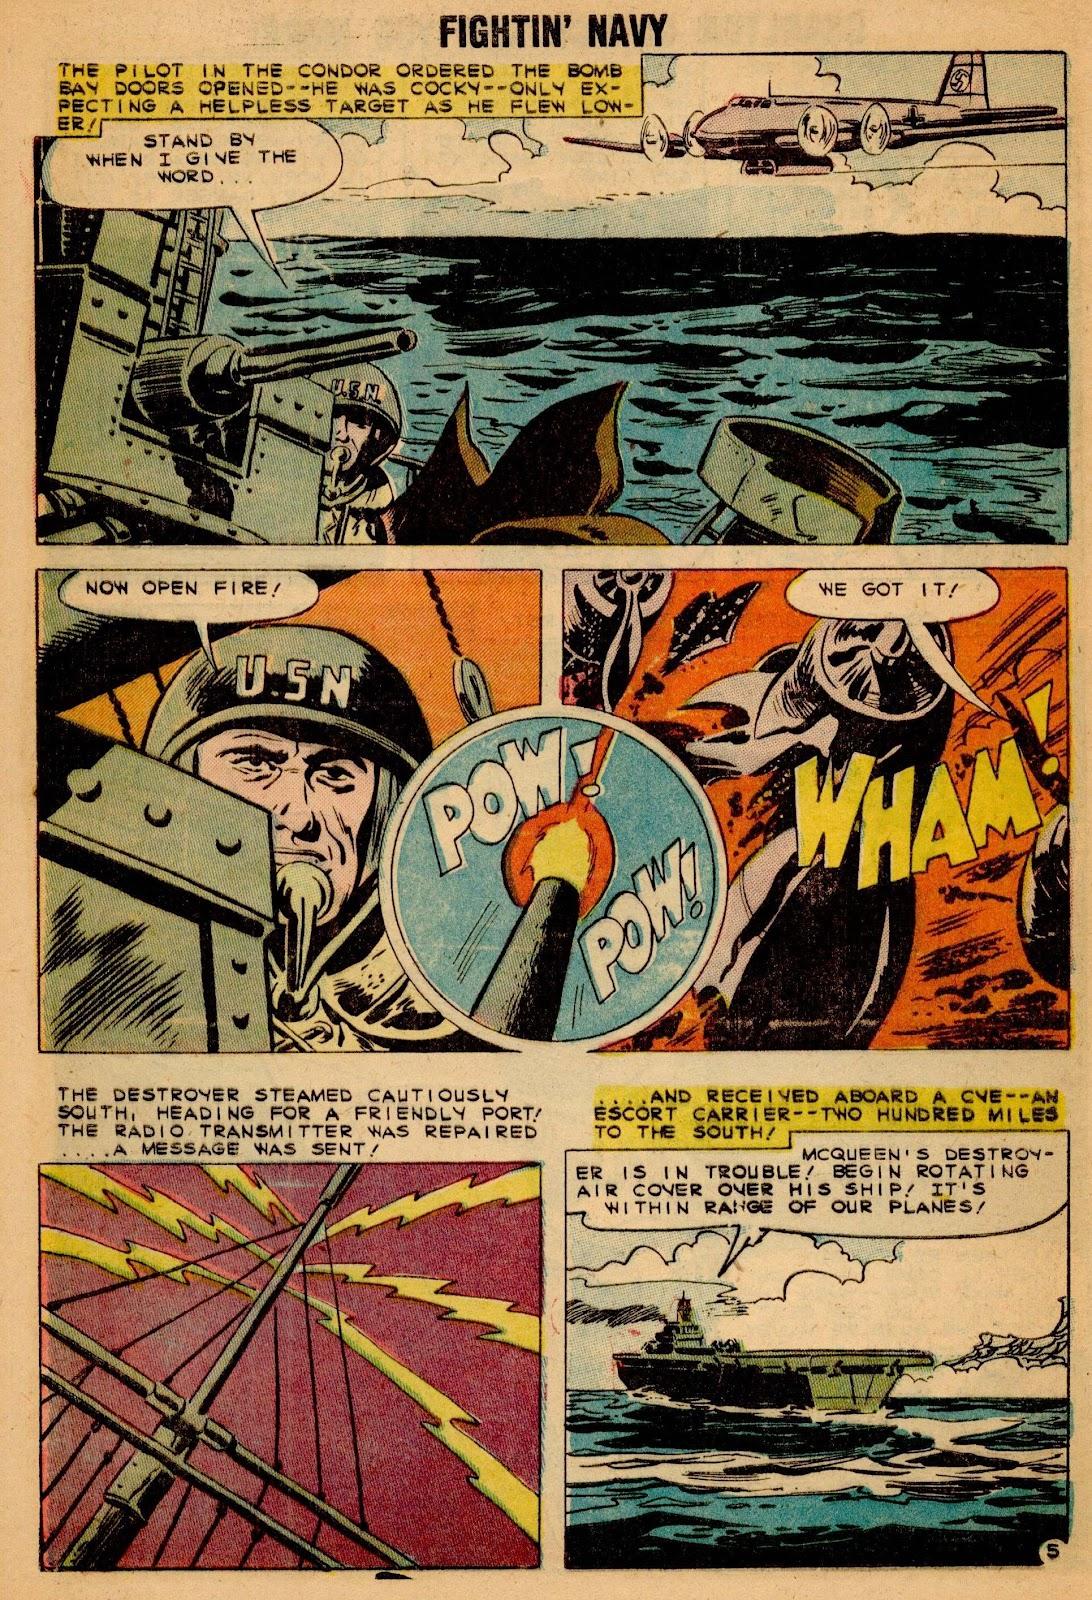 Read online Fightin' Navy comic -  Issue #90 - 8